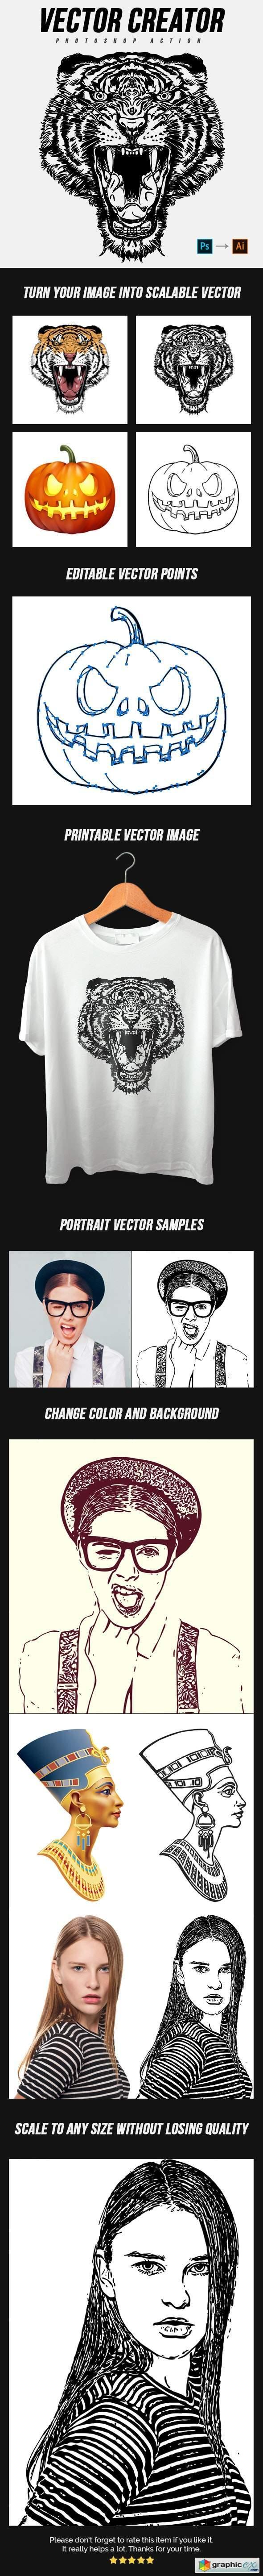 Vector Creator Photoshop Action 25072574